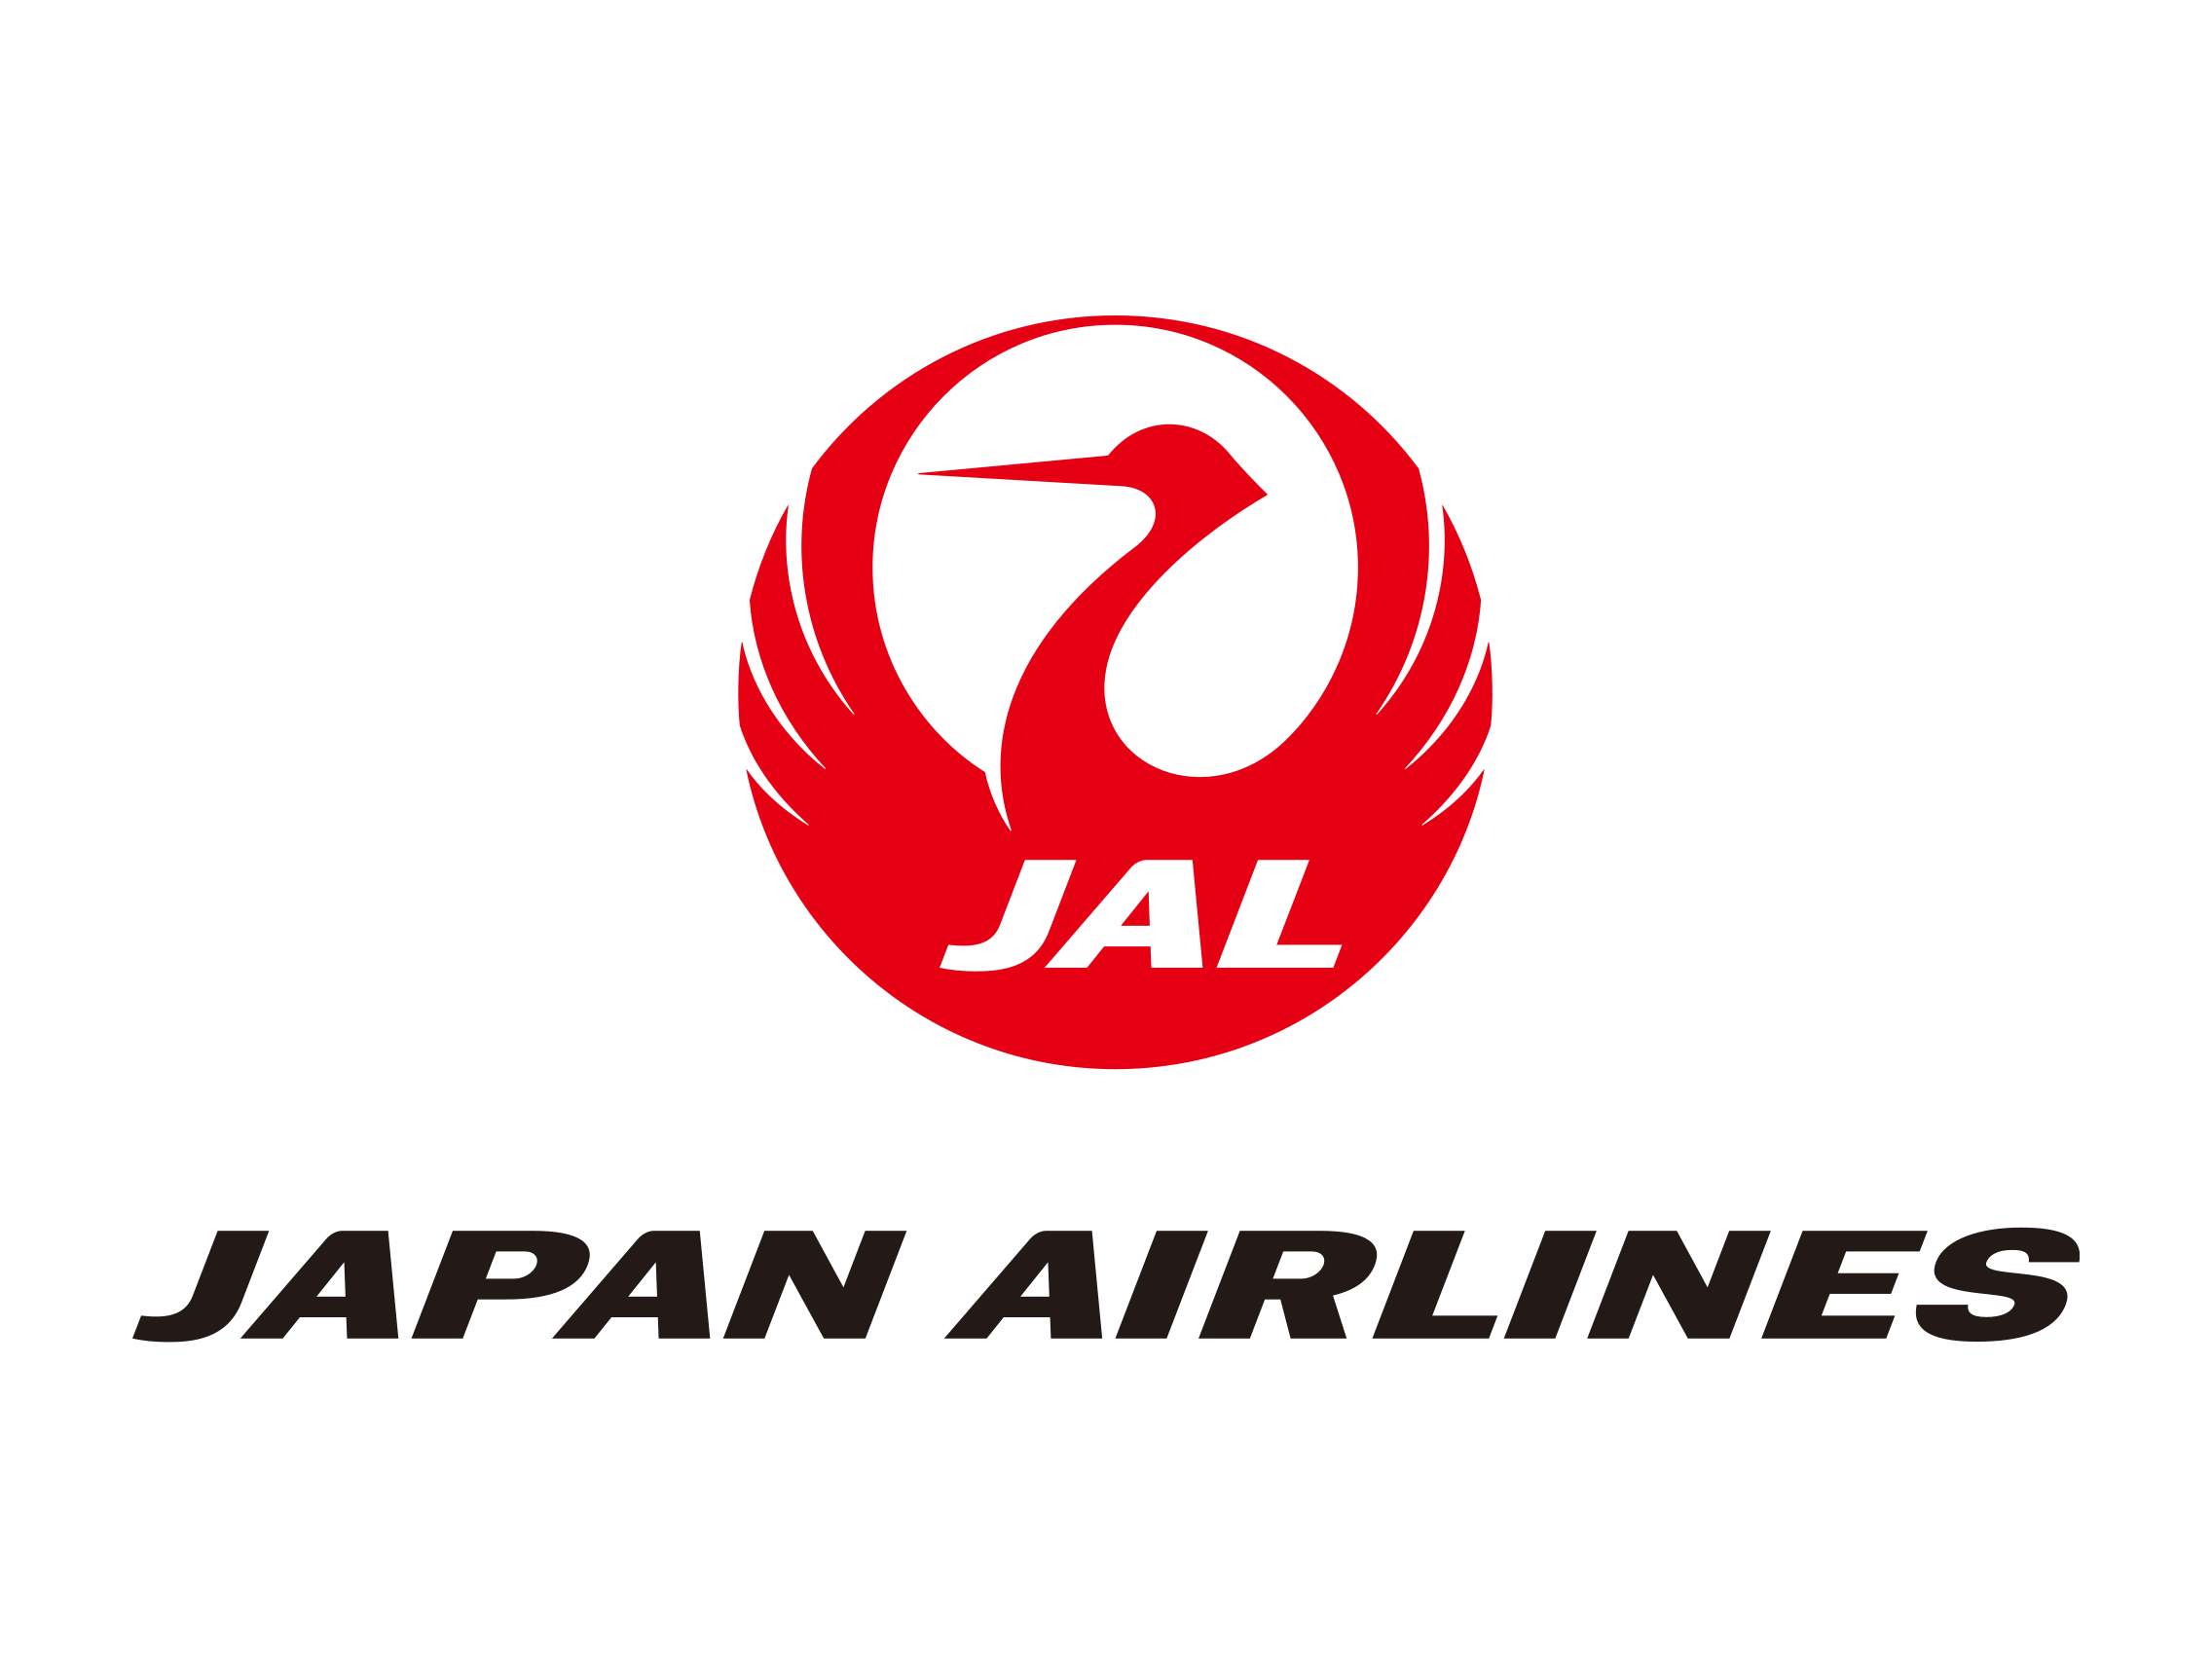 Japan_Airlines_logo-wordmark.png